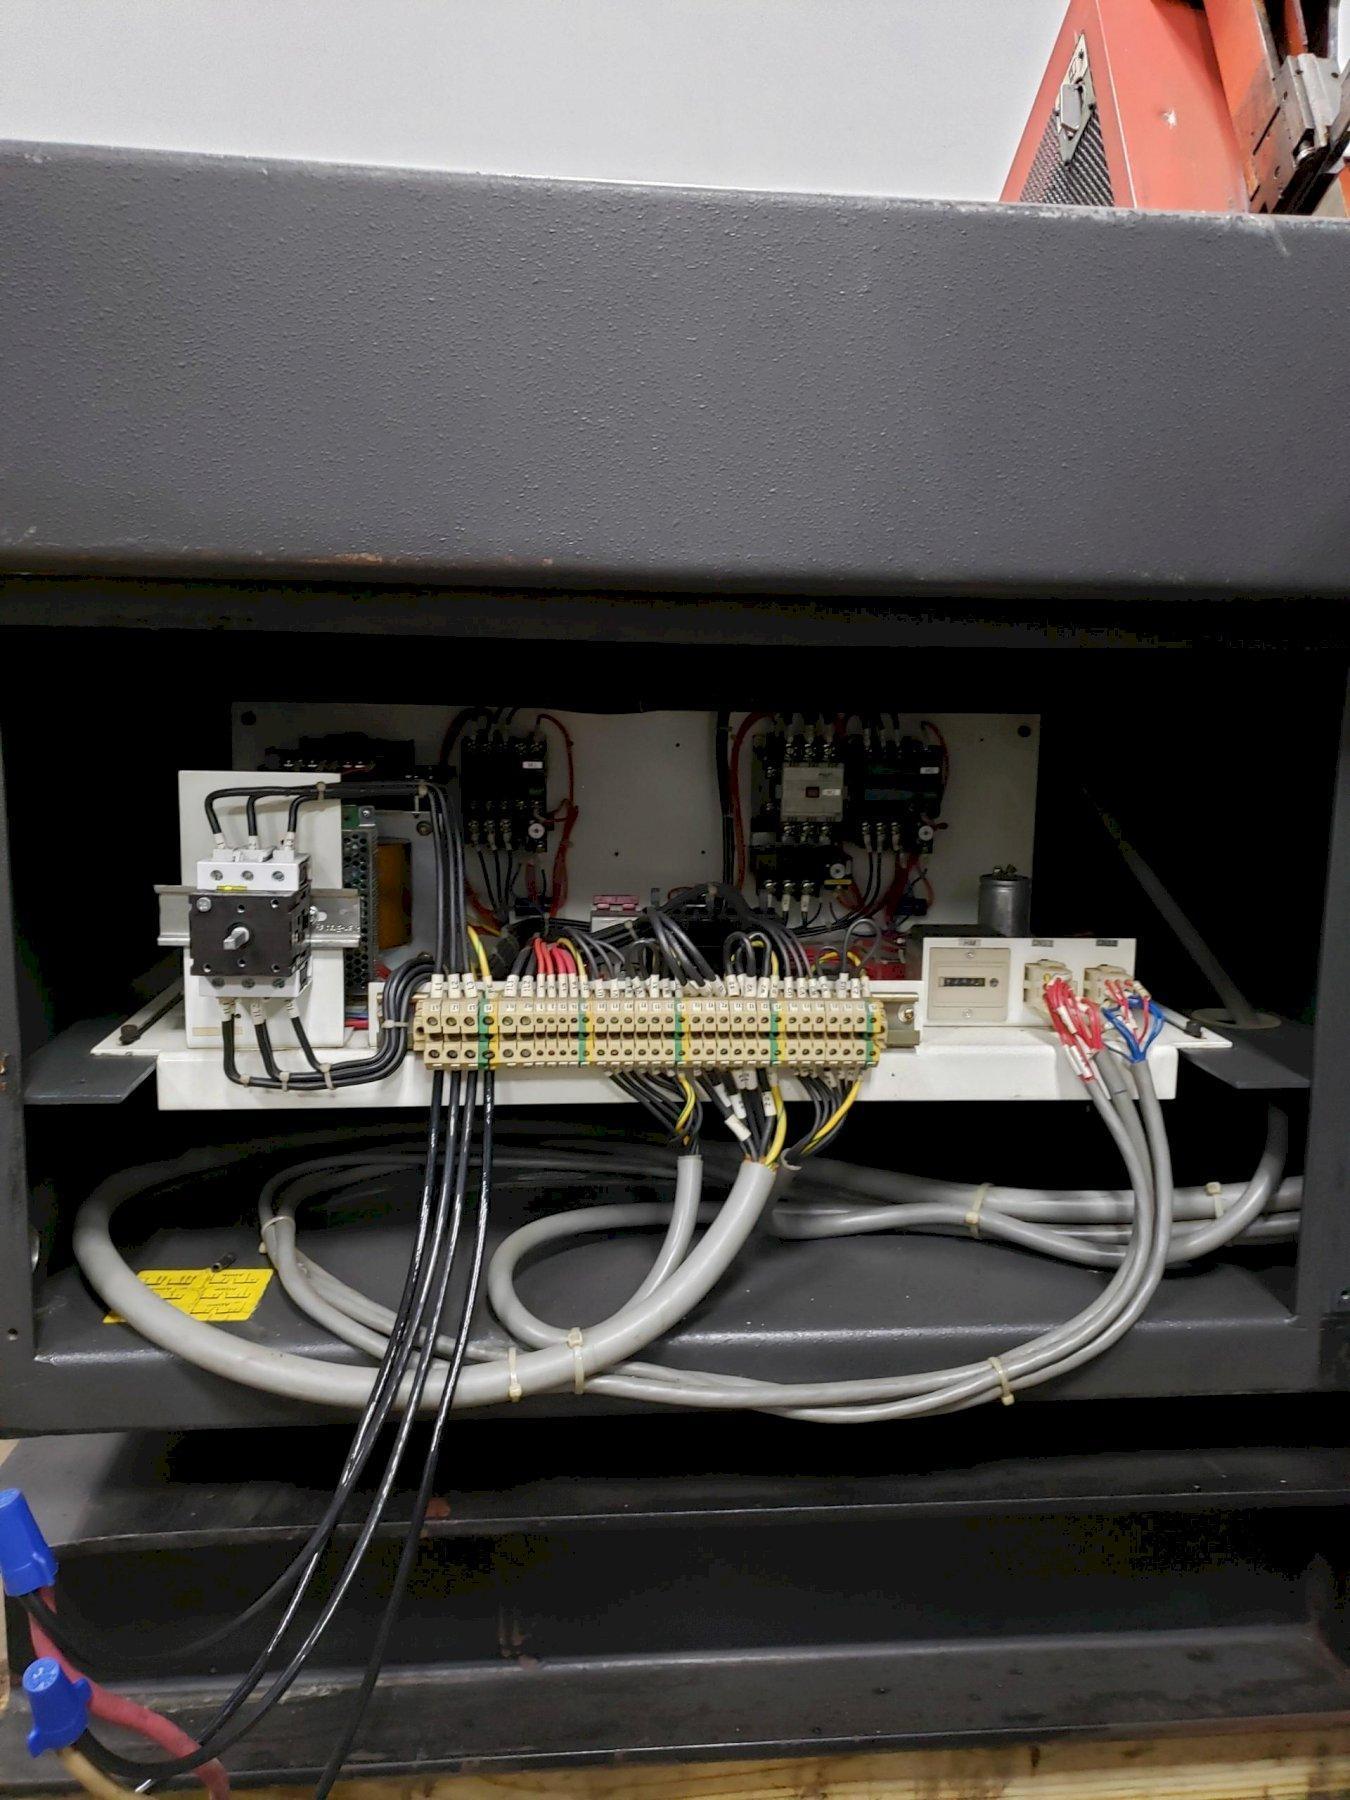 Amada HA-16S Automatic Bandsaw